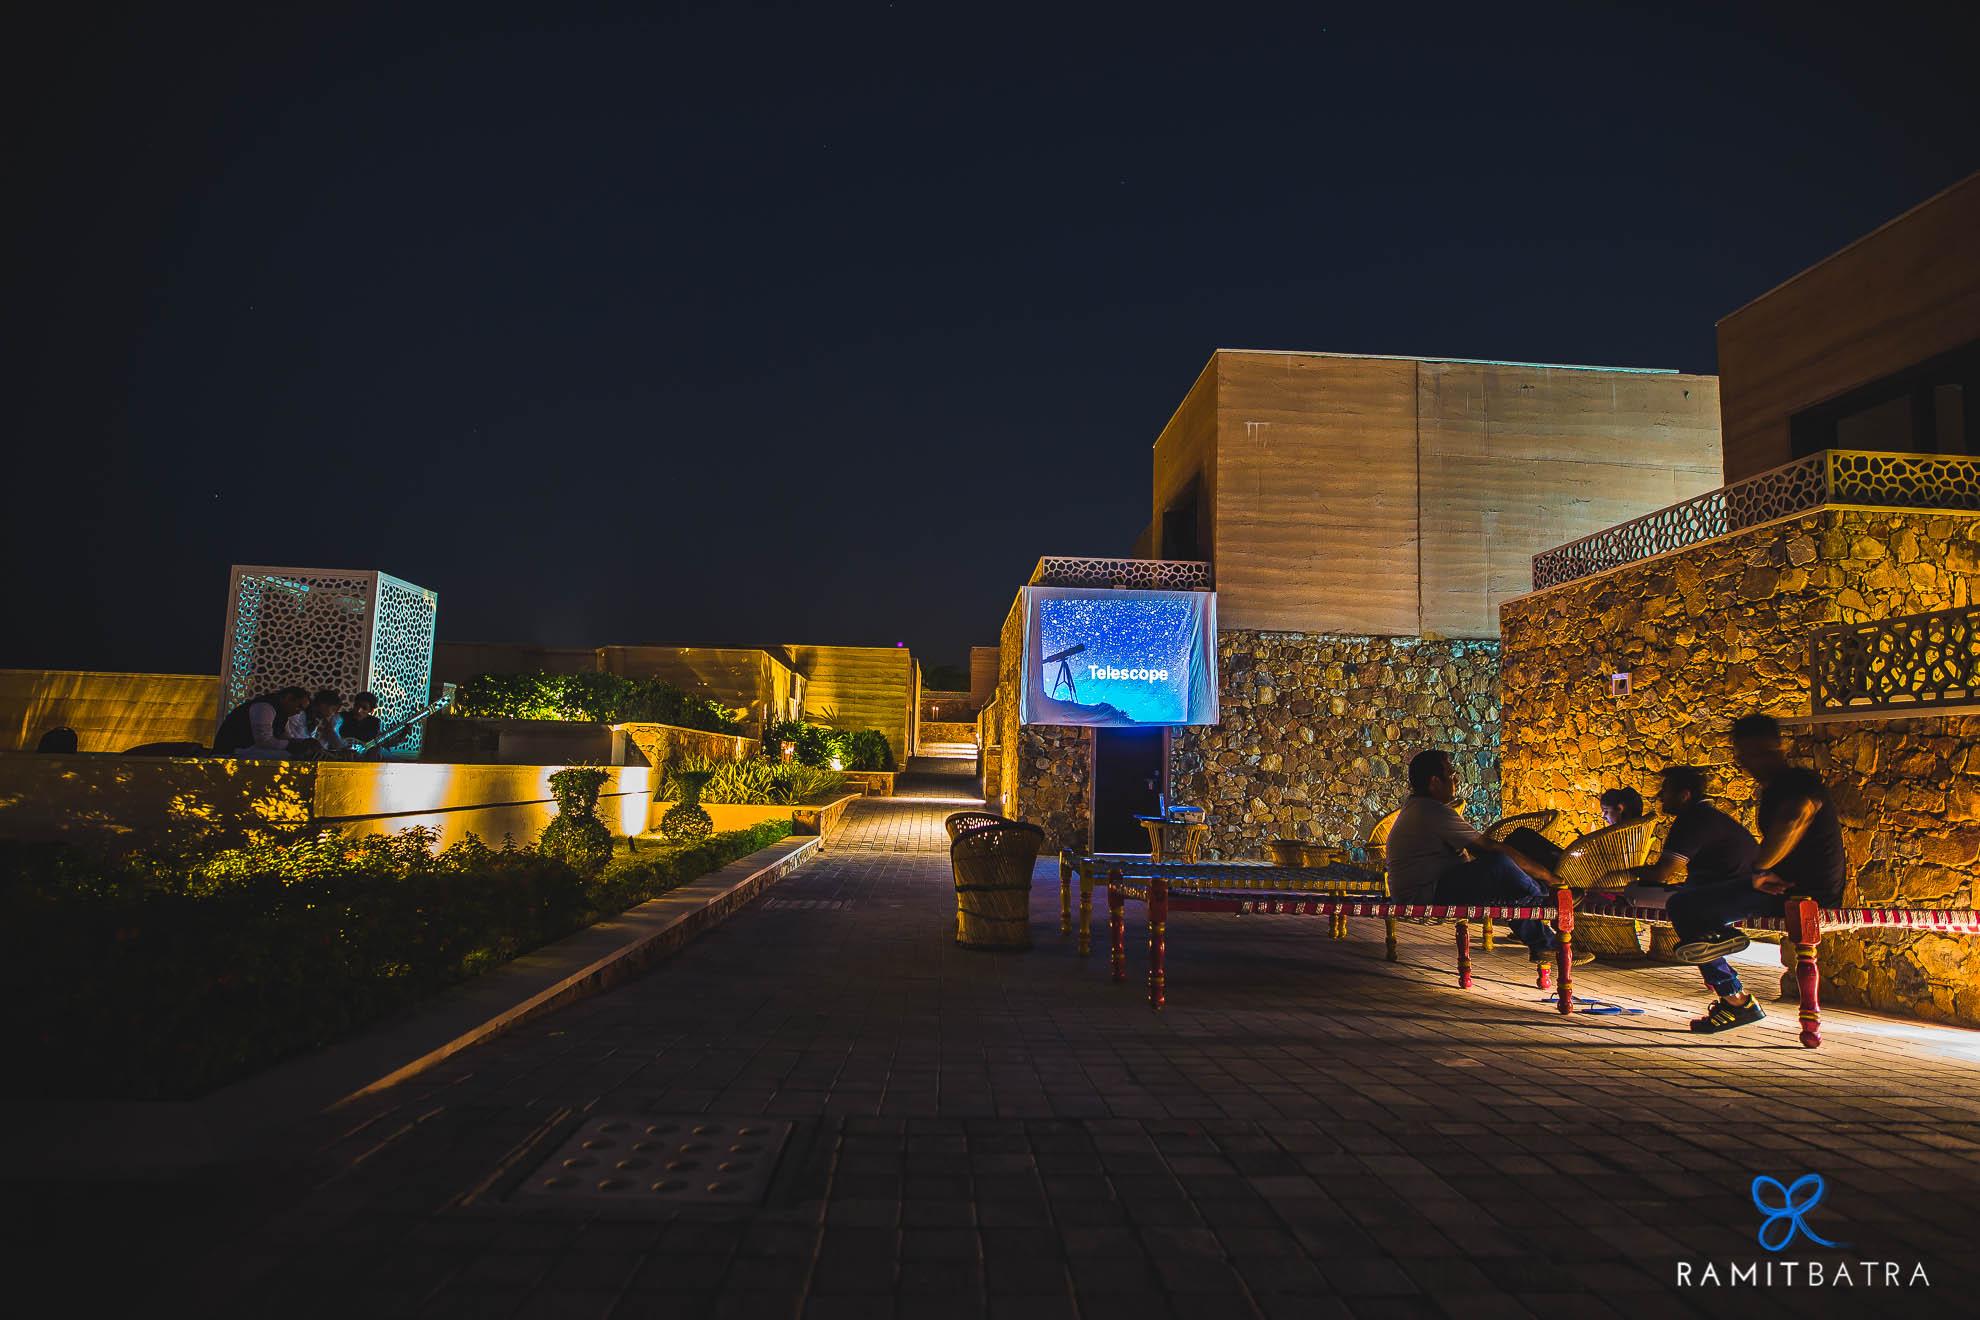 lalit-mangar-hotel-near-delhi-ramitbatra-040